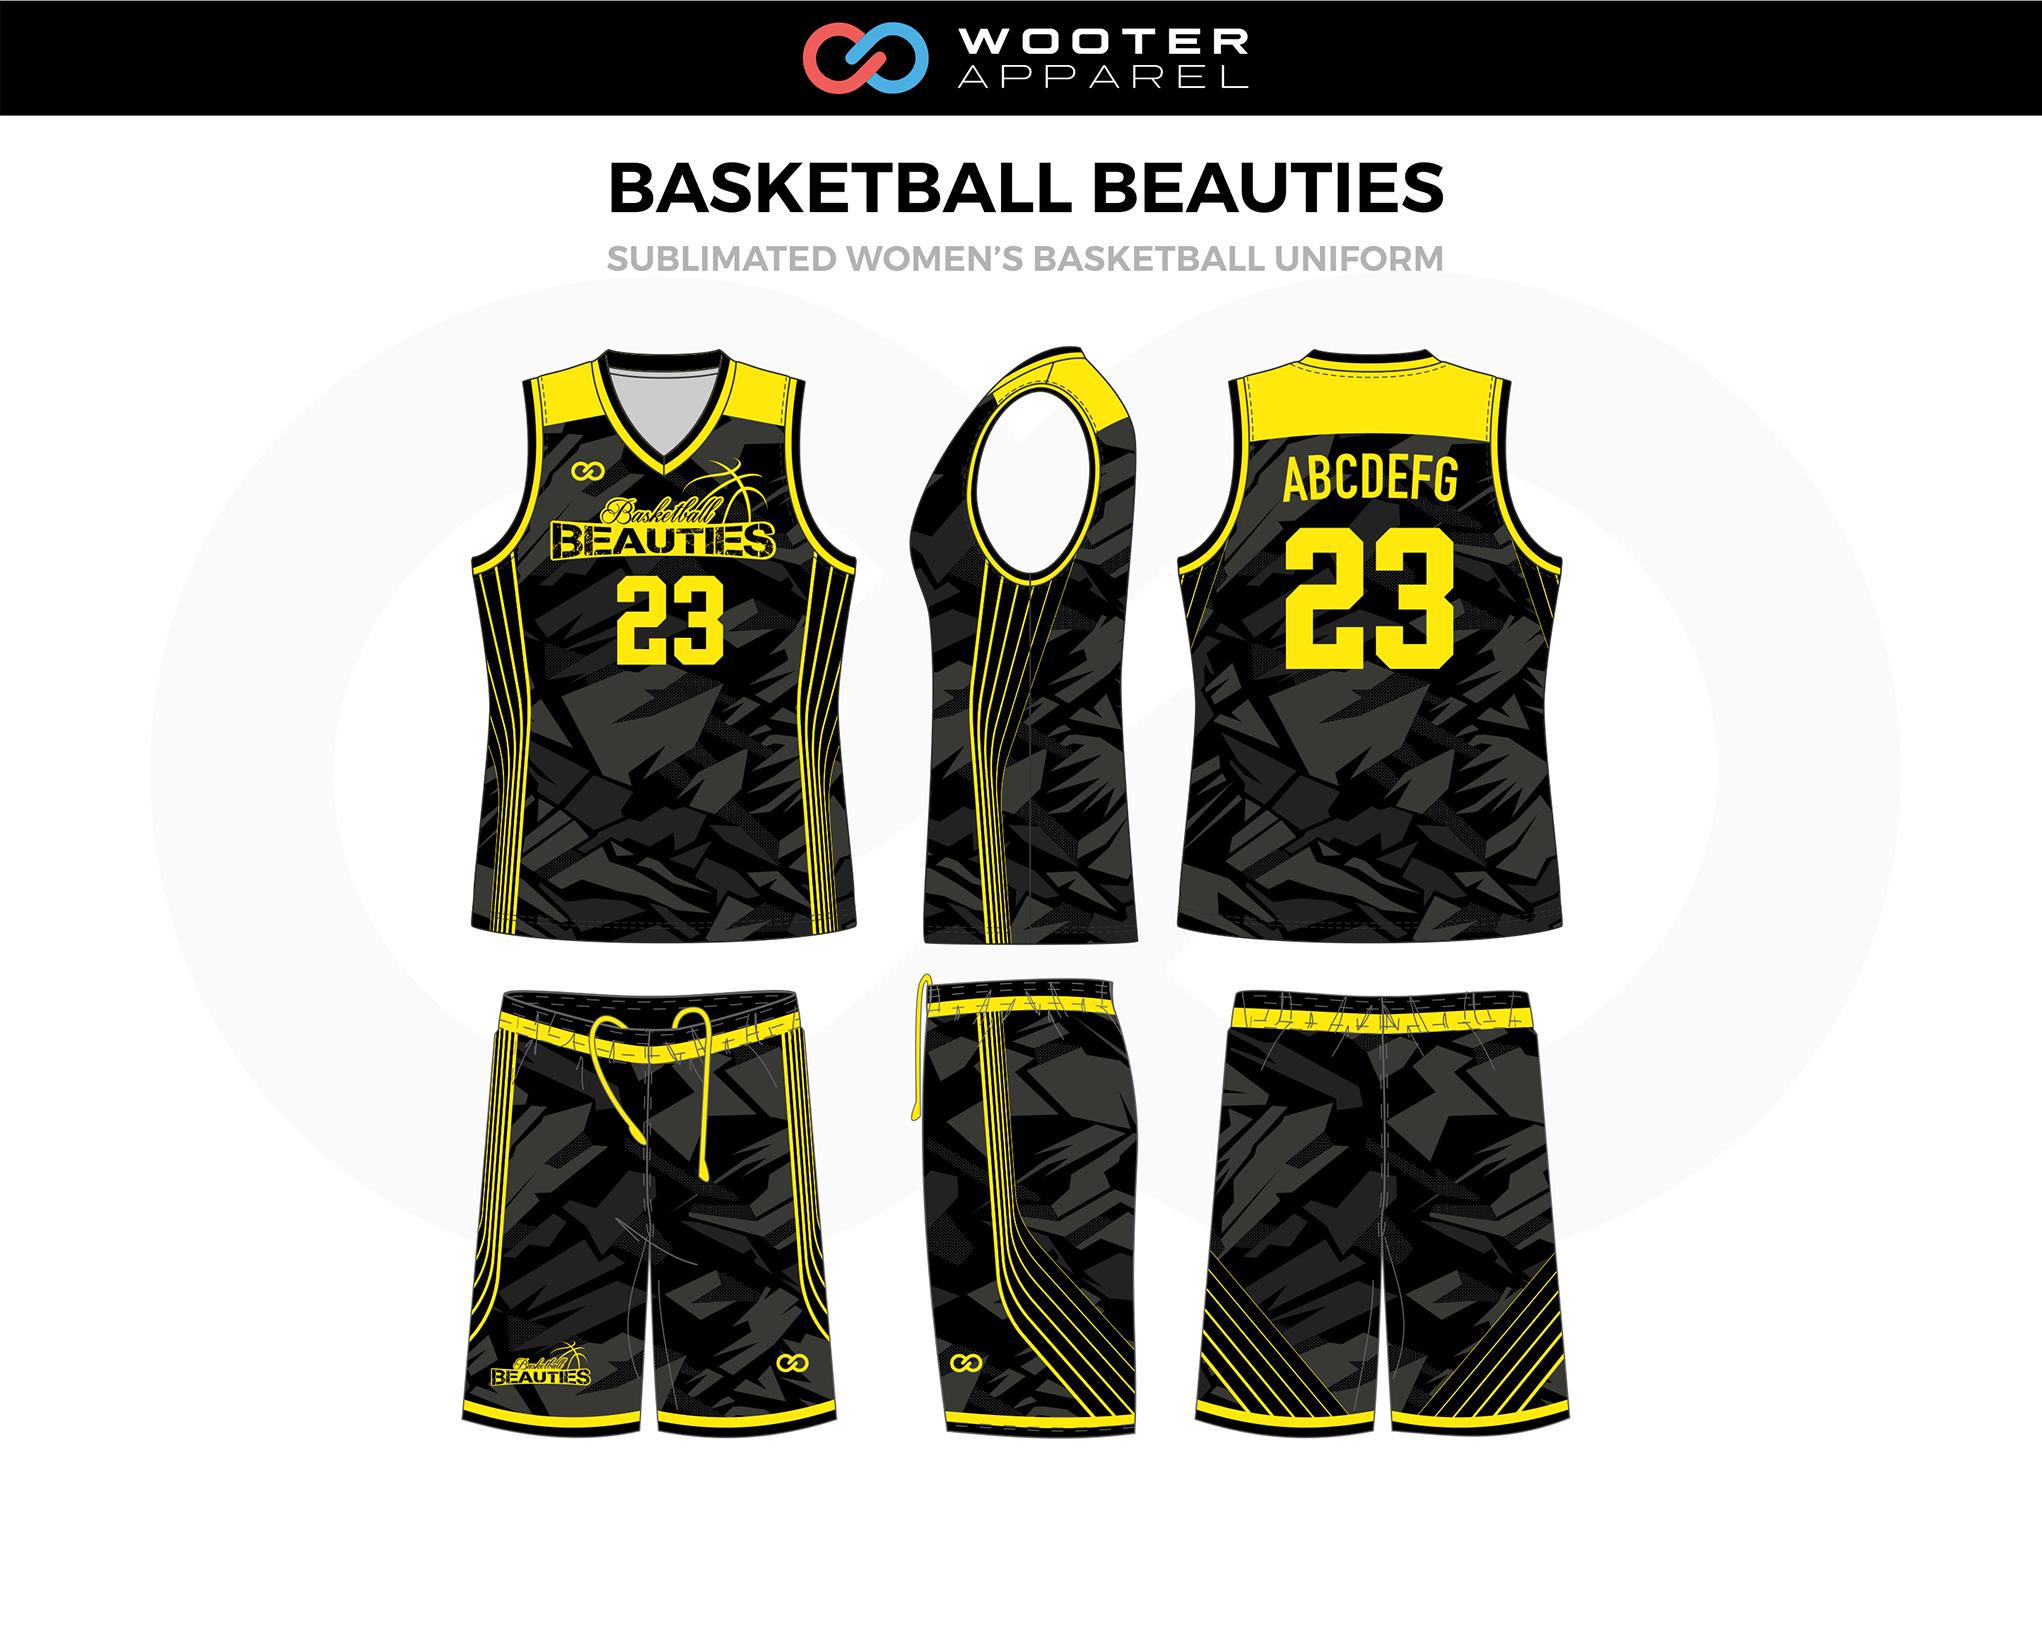 Basketball Uniform Designs Basketball Jersey Design Sublimation Wooter Apparel